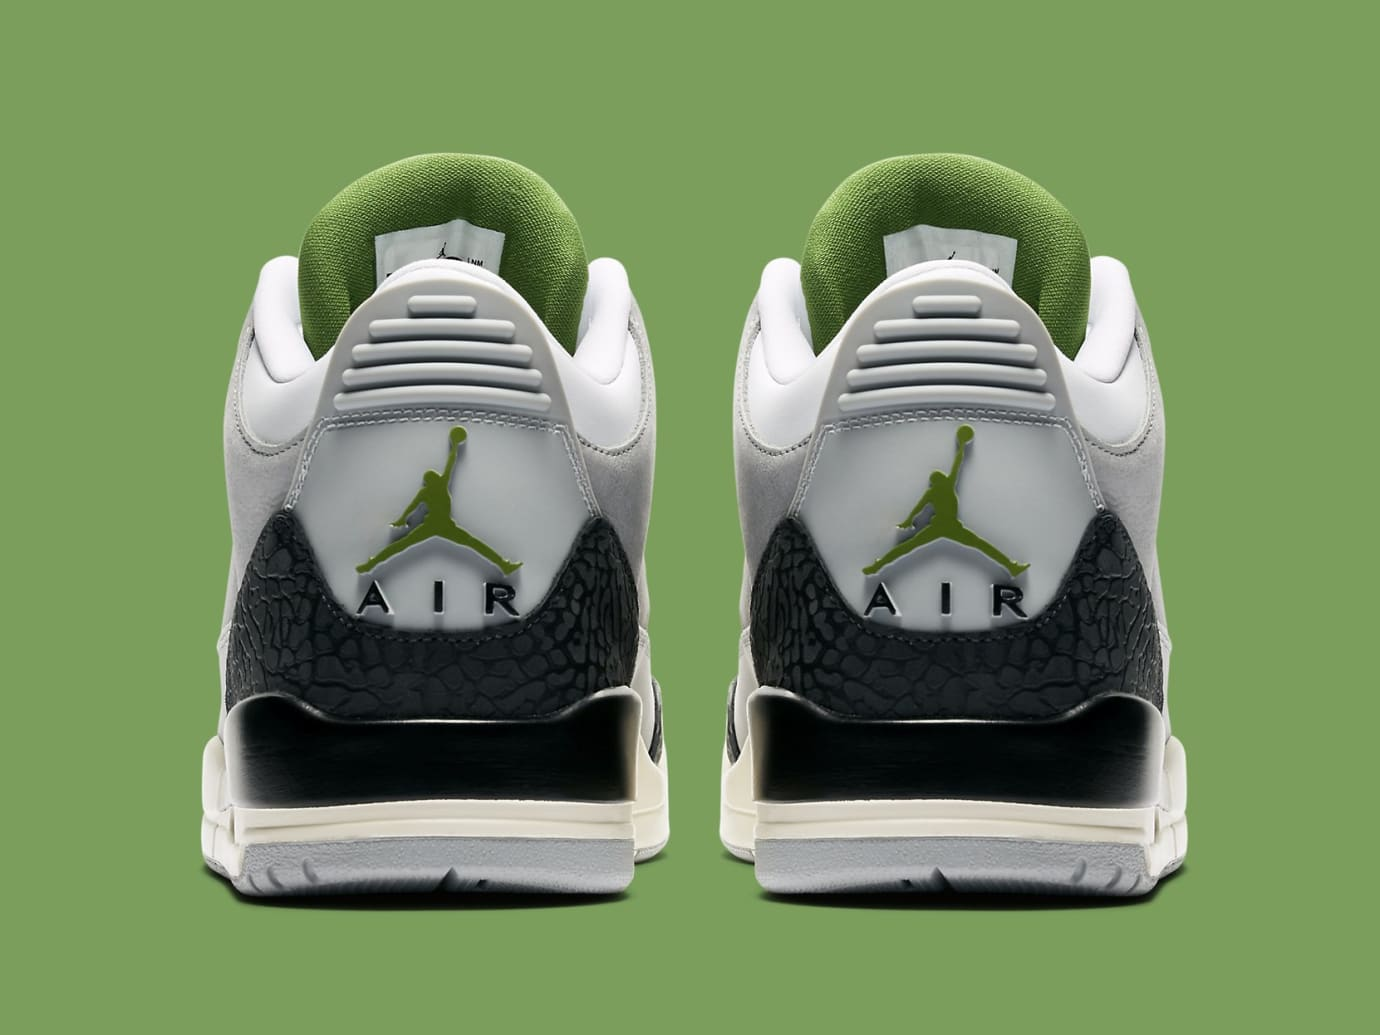 df7f952e40a6f3 Image via Nike Air Jordan 3 III Chlorophyll Tinker Release Date 136064-006  Heel